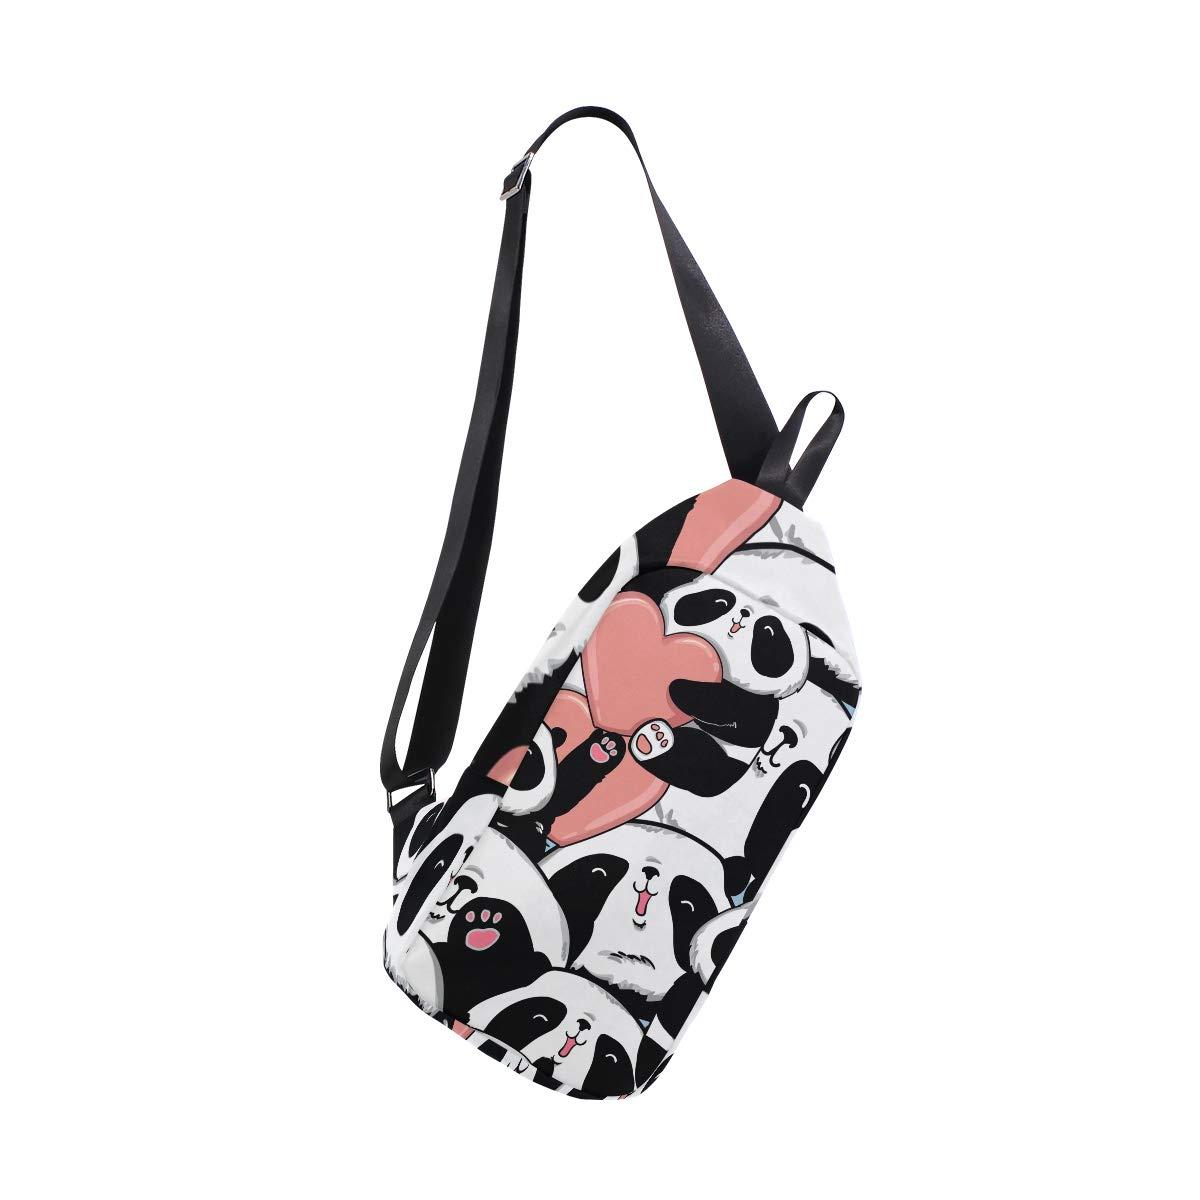 TFONE Cute Panda Heart Pattern Crossbody Bag Lightweight Chest Shoulder Messenger Pack Backpack Sling Bag